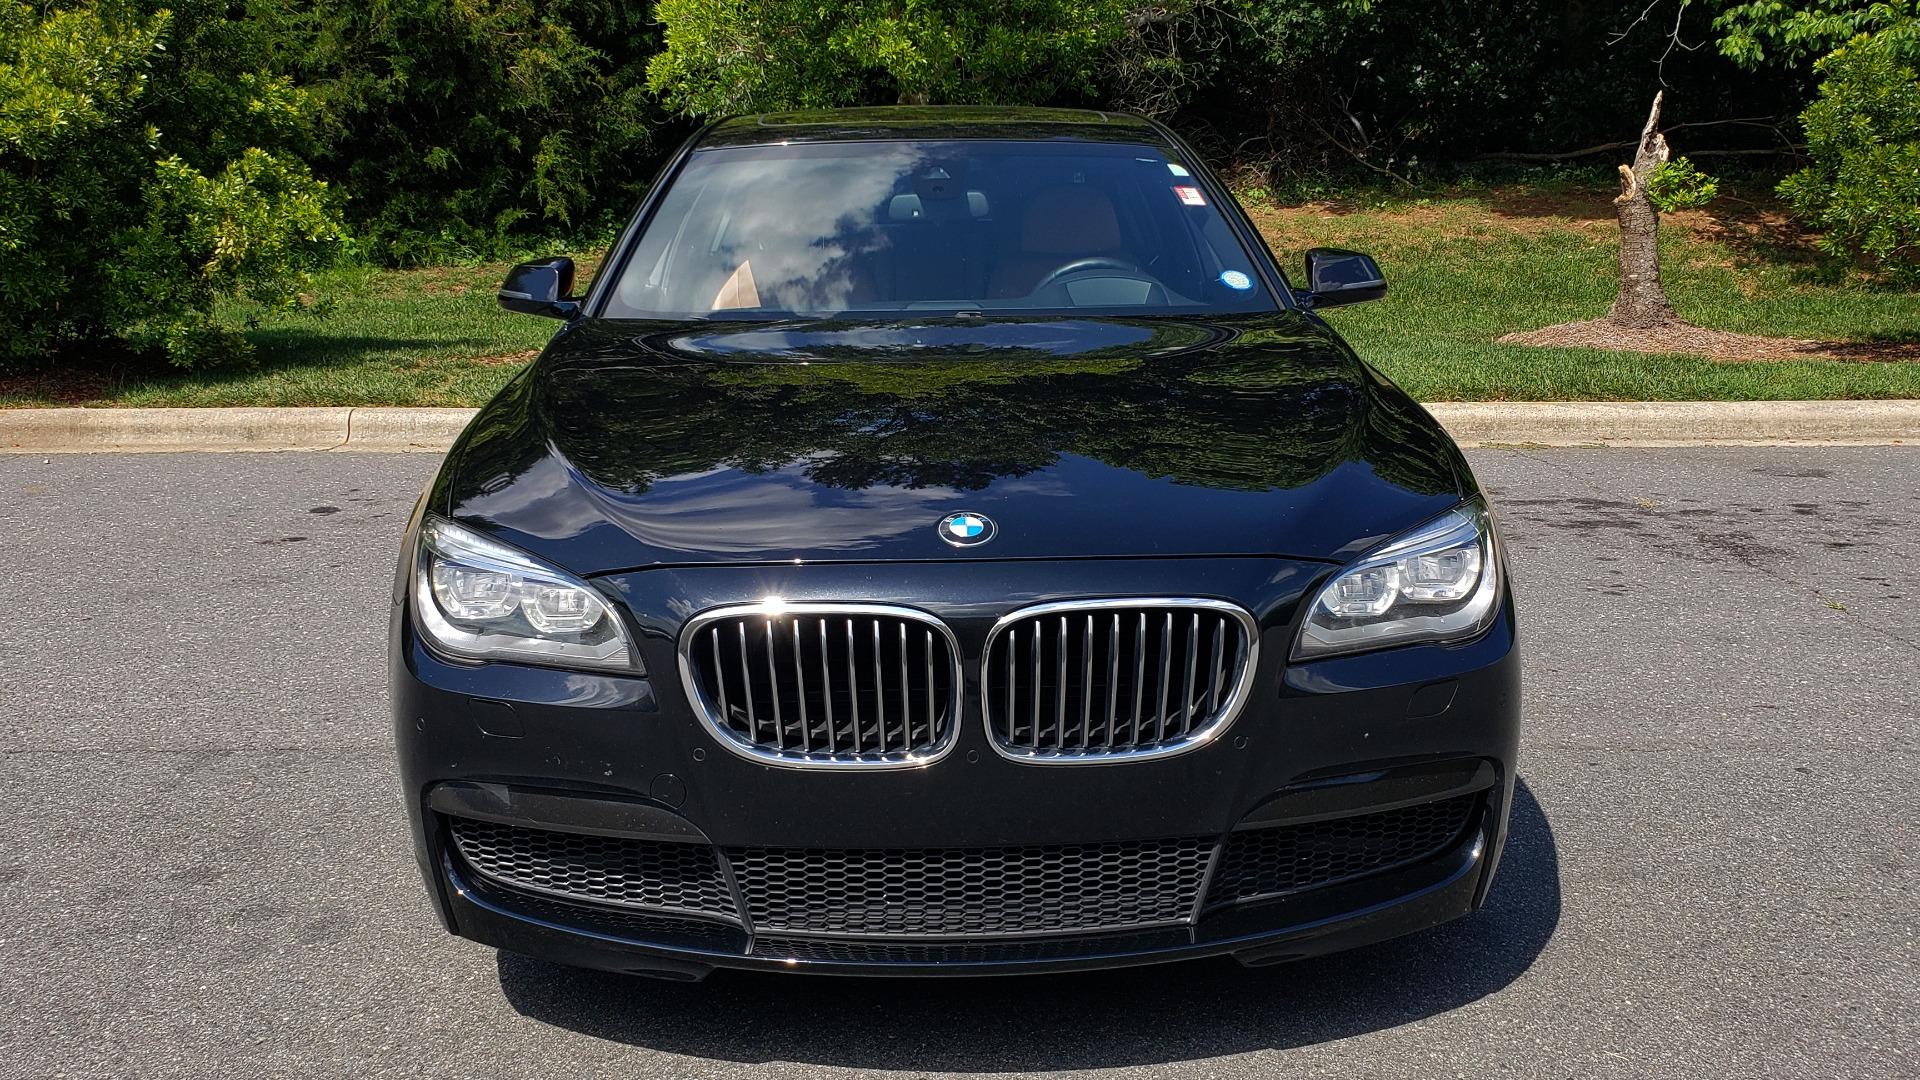 Used 2014 BMW 7 SERIES 750LI M-SPORT / EXEC PKG / DRVR ASST / LIGHTING / NAV / SUNROOF for sale Sold at Formula Imports in Charlotte NC 28227 17